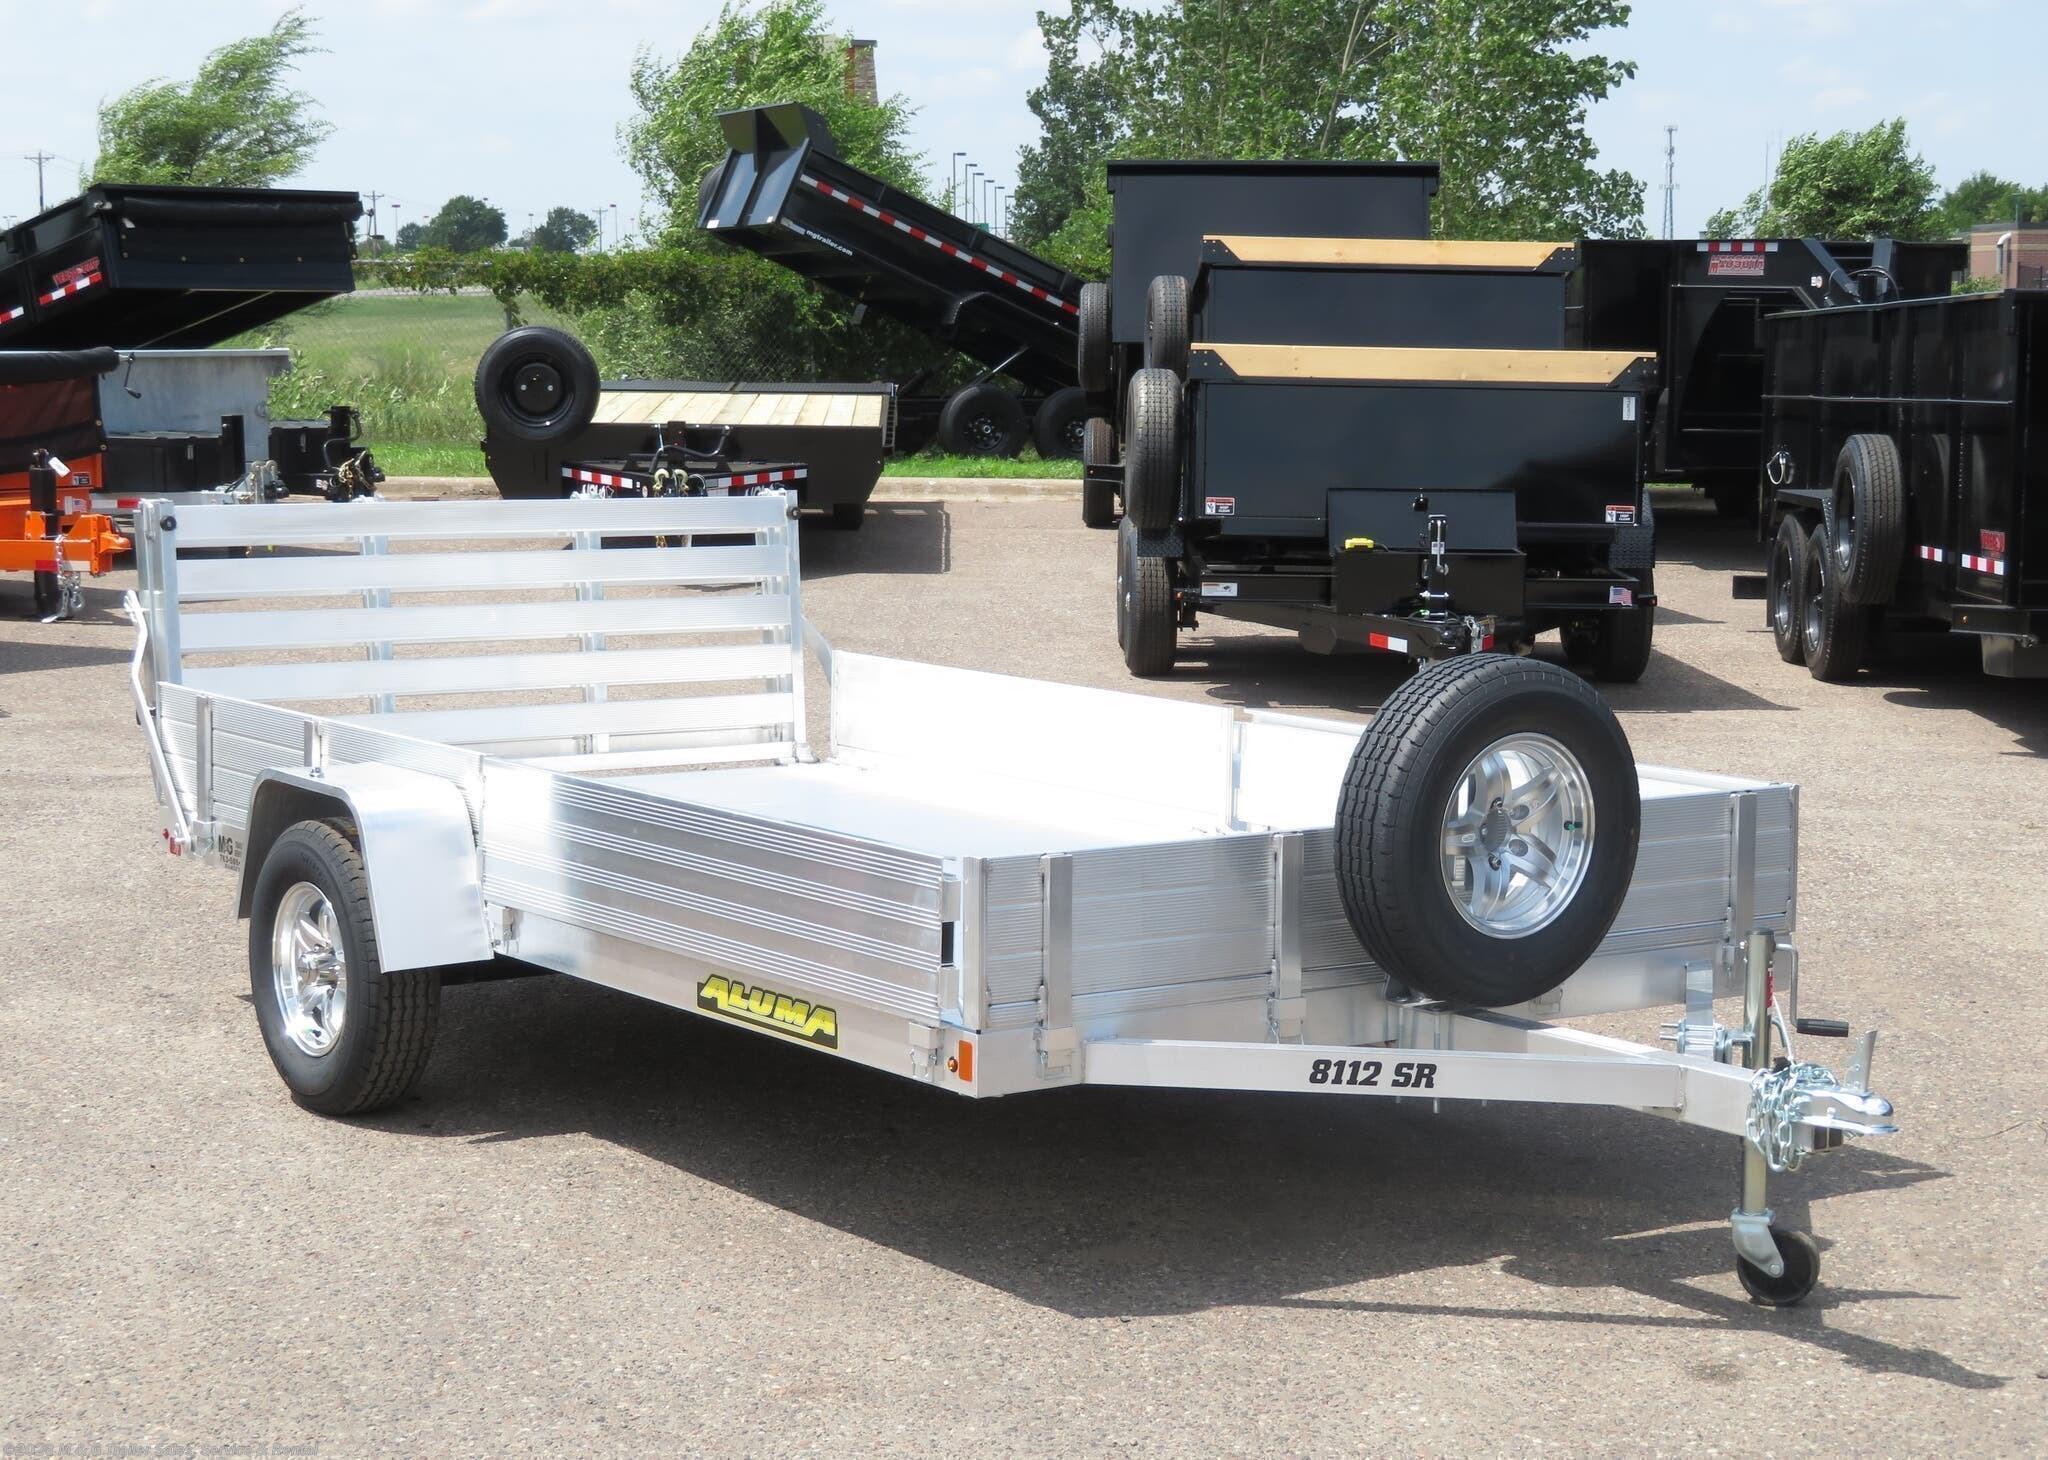 2022 Aluma 8112 SR Aluminum ATV/Utility Trailer - Stock #230120